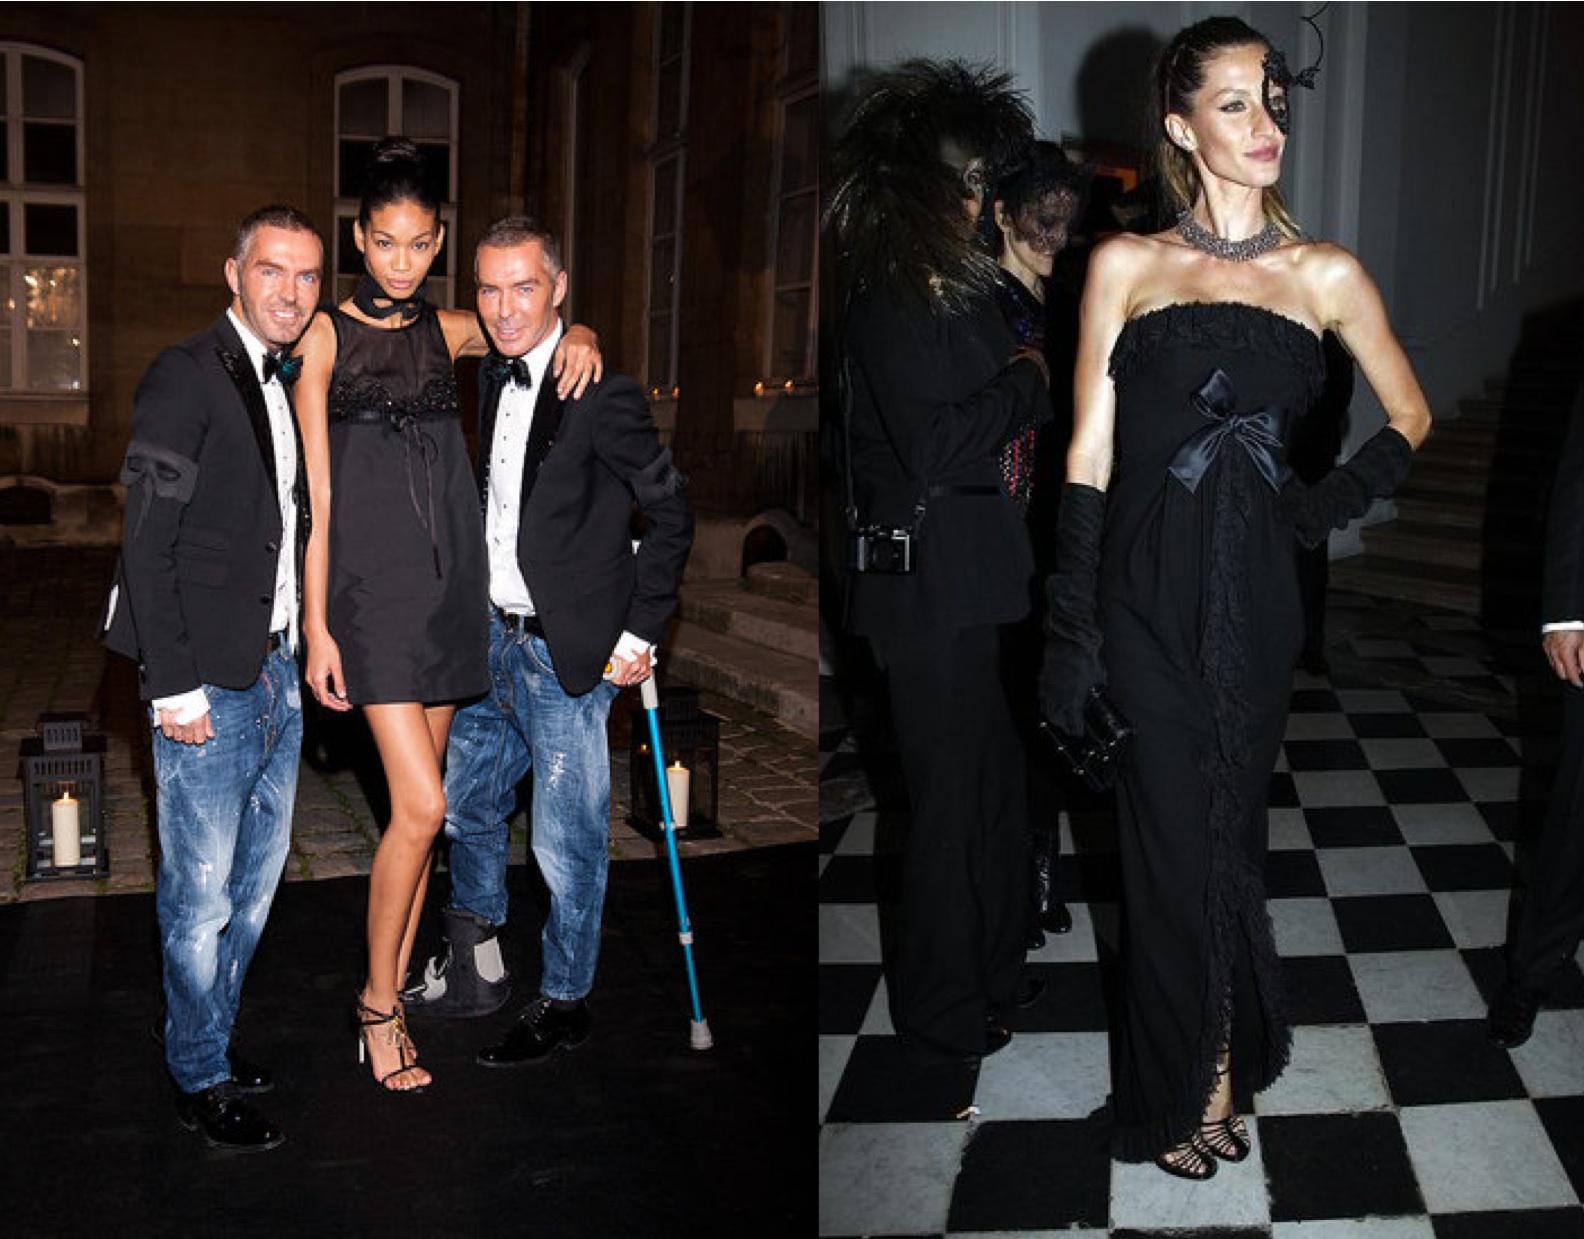 http://1.bp.blogspot.com/_PfmV3qvy8FY/TRzwRrIHgII/AAAAAAAAArw/hiU3ZxXLACo/s1600/la+modella+mafia+Vogue+Masquerade+Ball+Dan+Caten%252C+Chanel+Iman%252C+Dean+Caten+%2526+Gisele+Bundchen.jpg